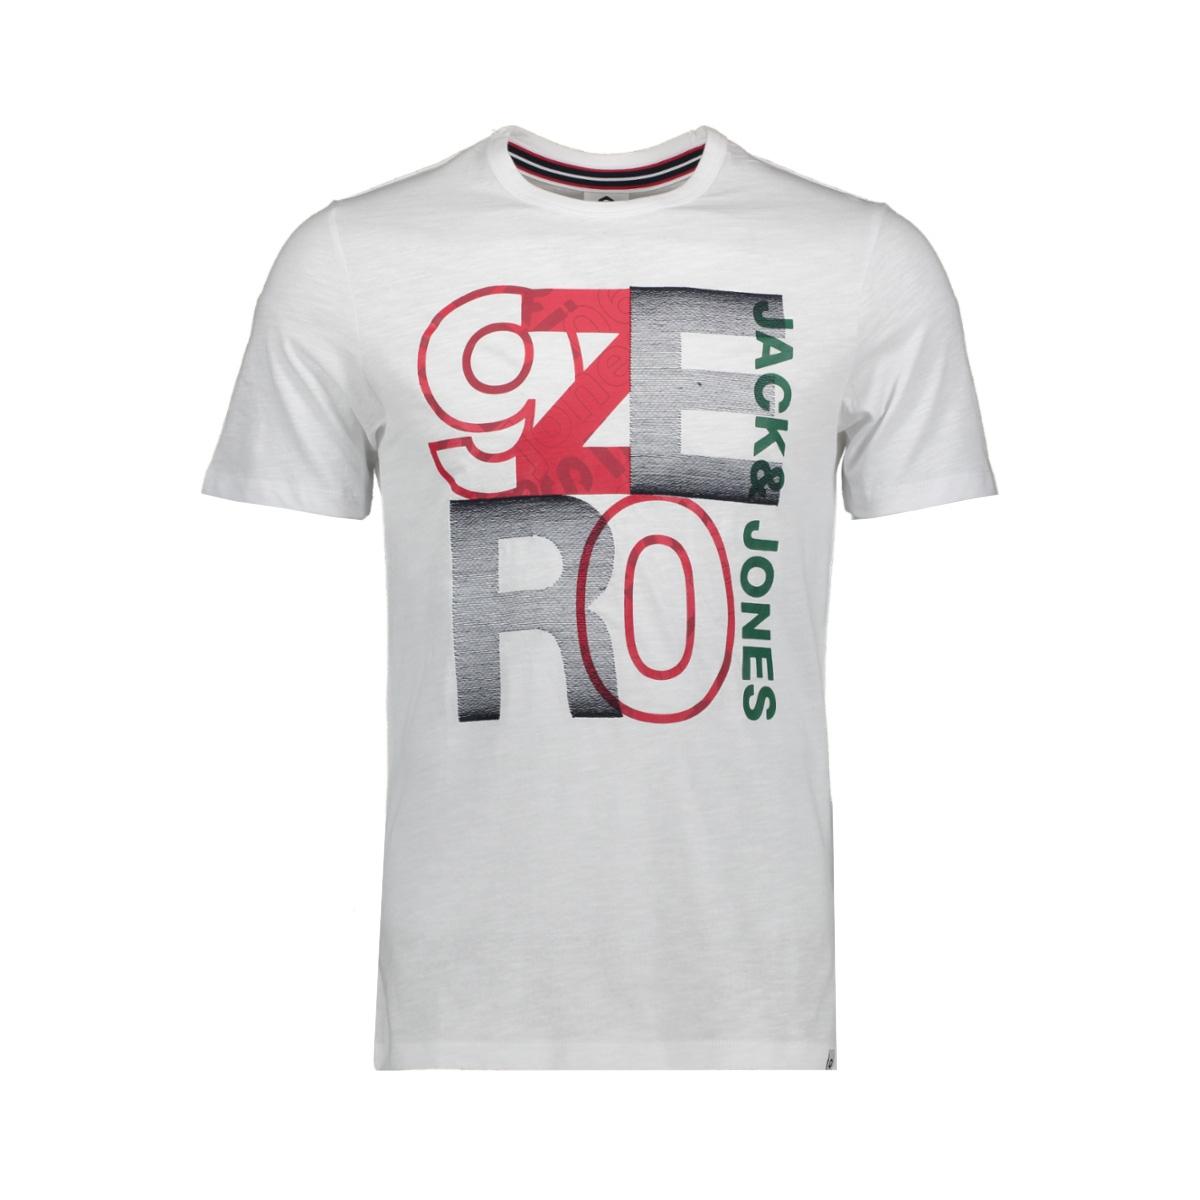 jcotilly tee ss crew neck 12148516 jack & jones t-shirt white/slim